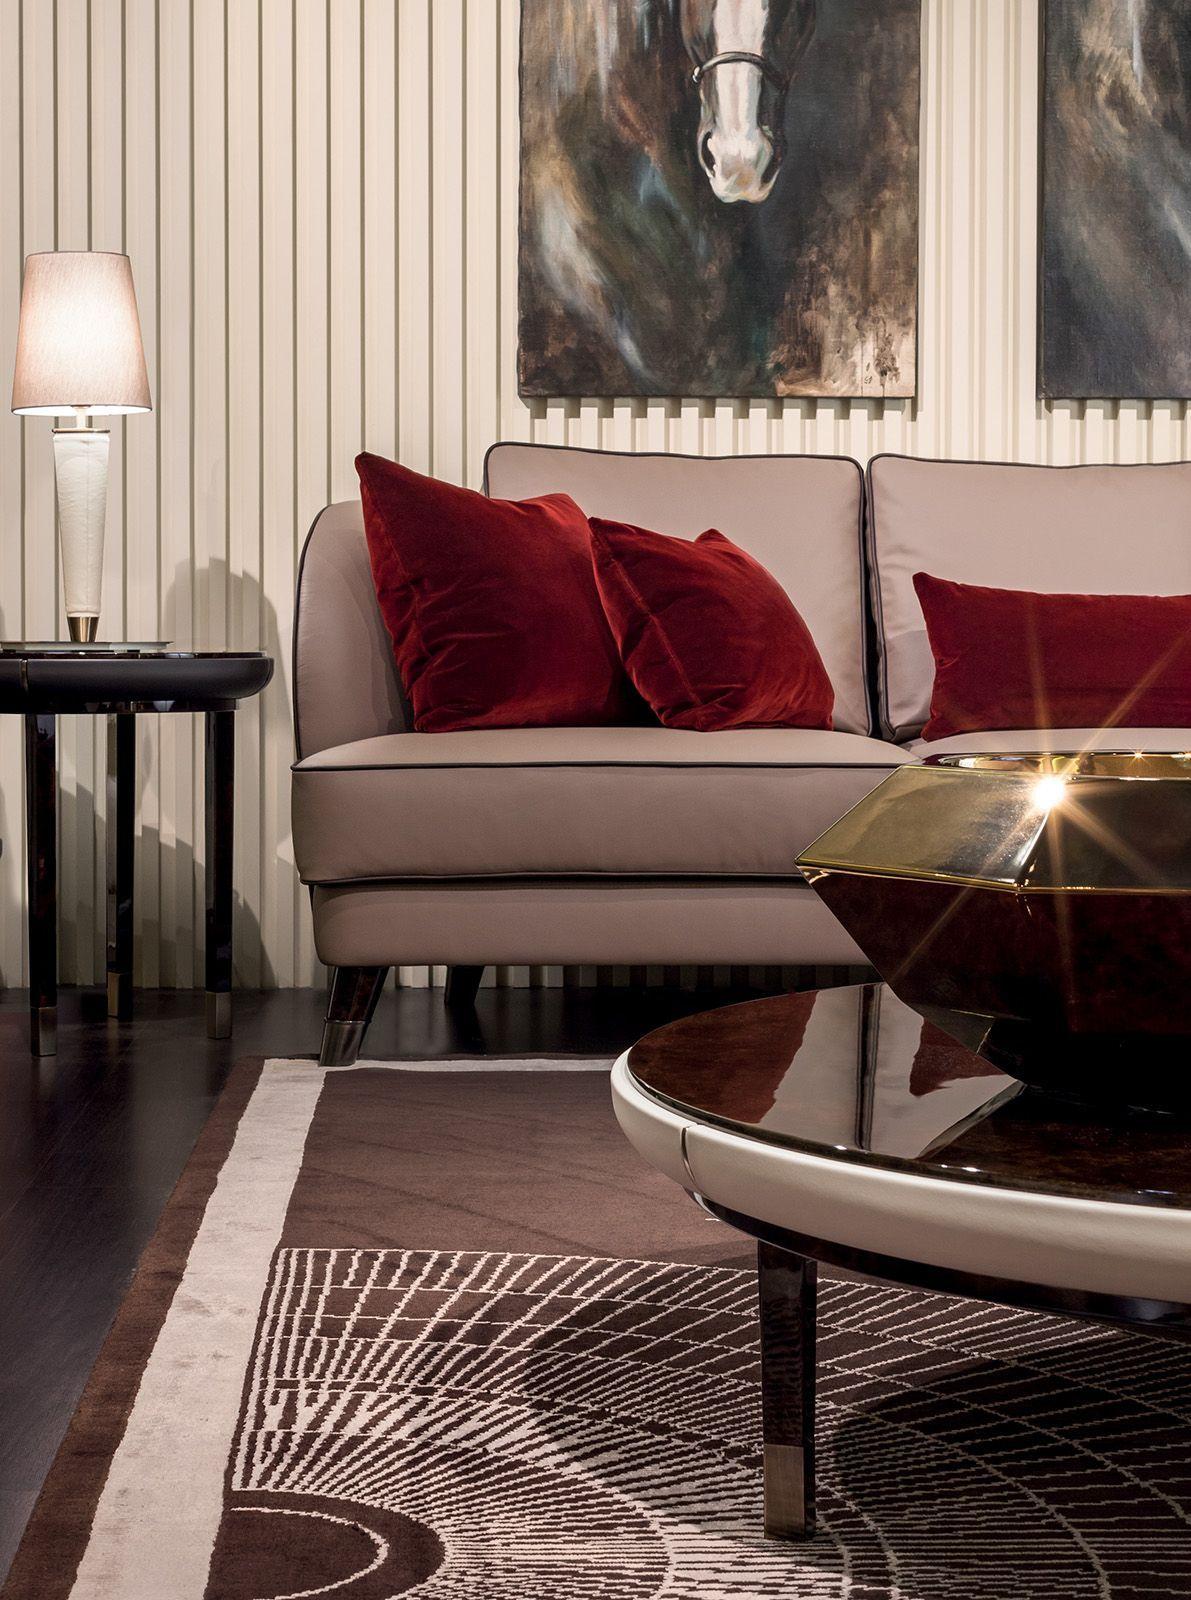 Noir Collection Www Turri It Italian Luxury Living Room Furniture Italyanskaya Mebel Dizajn Interera Mebel